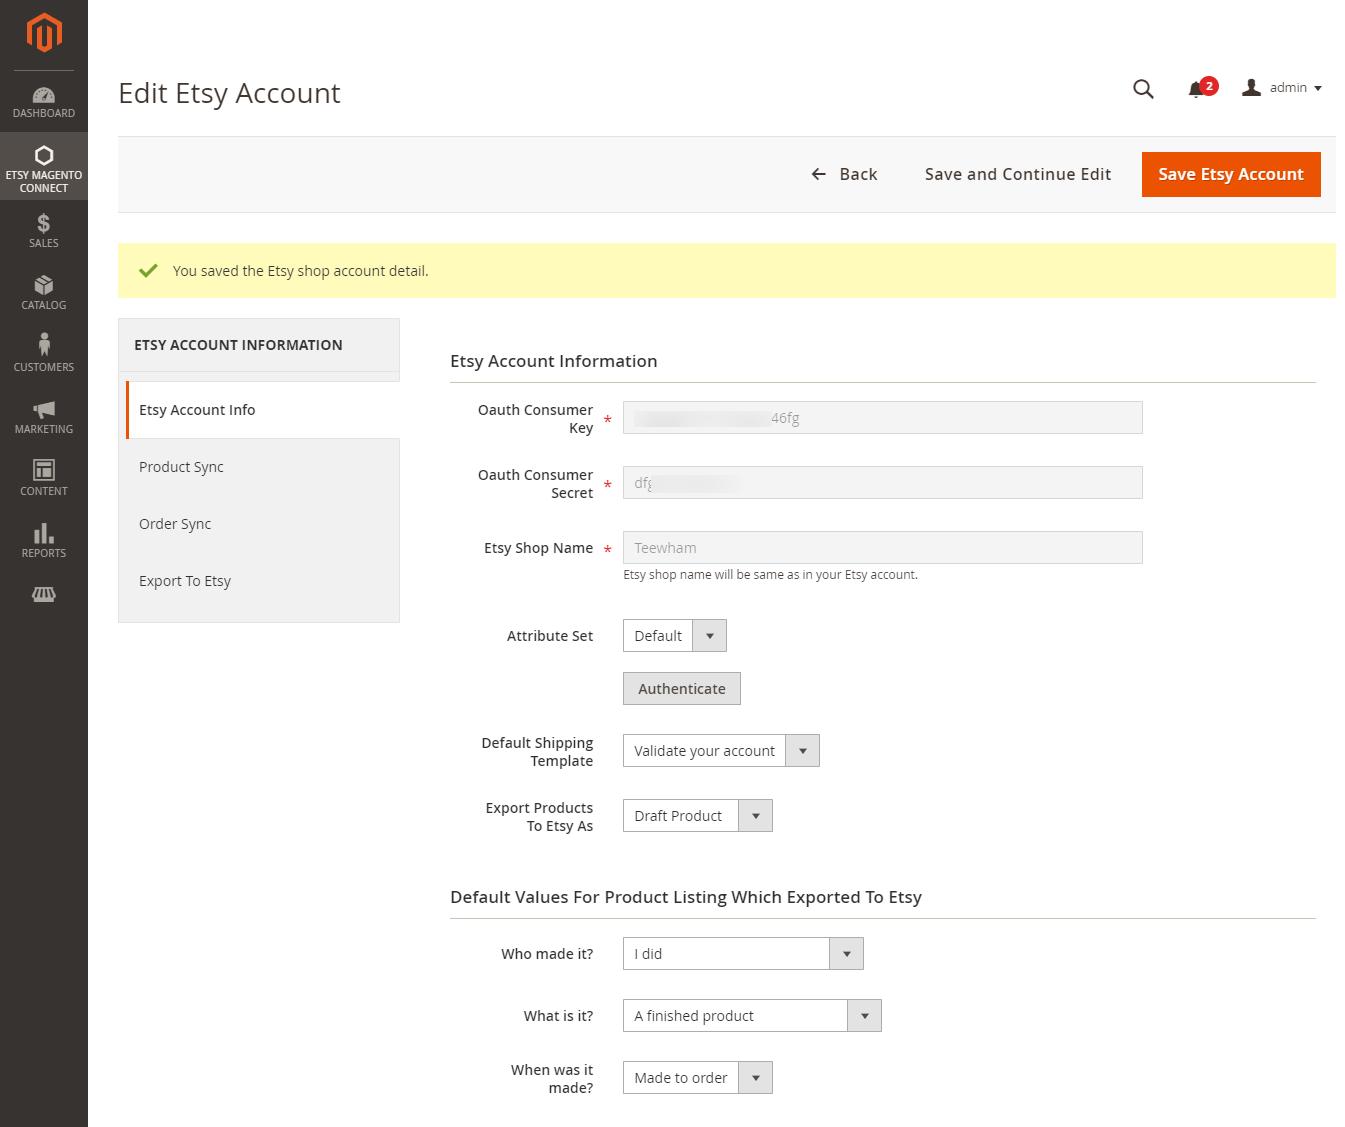 webkul-magento2-etsy-connector-admin-edit-etsy-account-not-autyhenticated-credentials